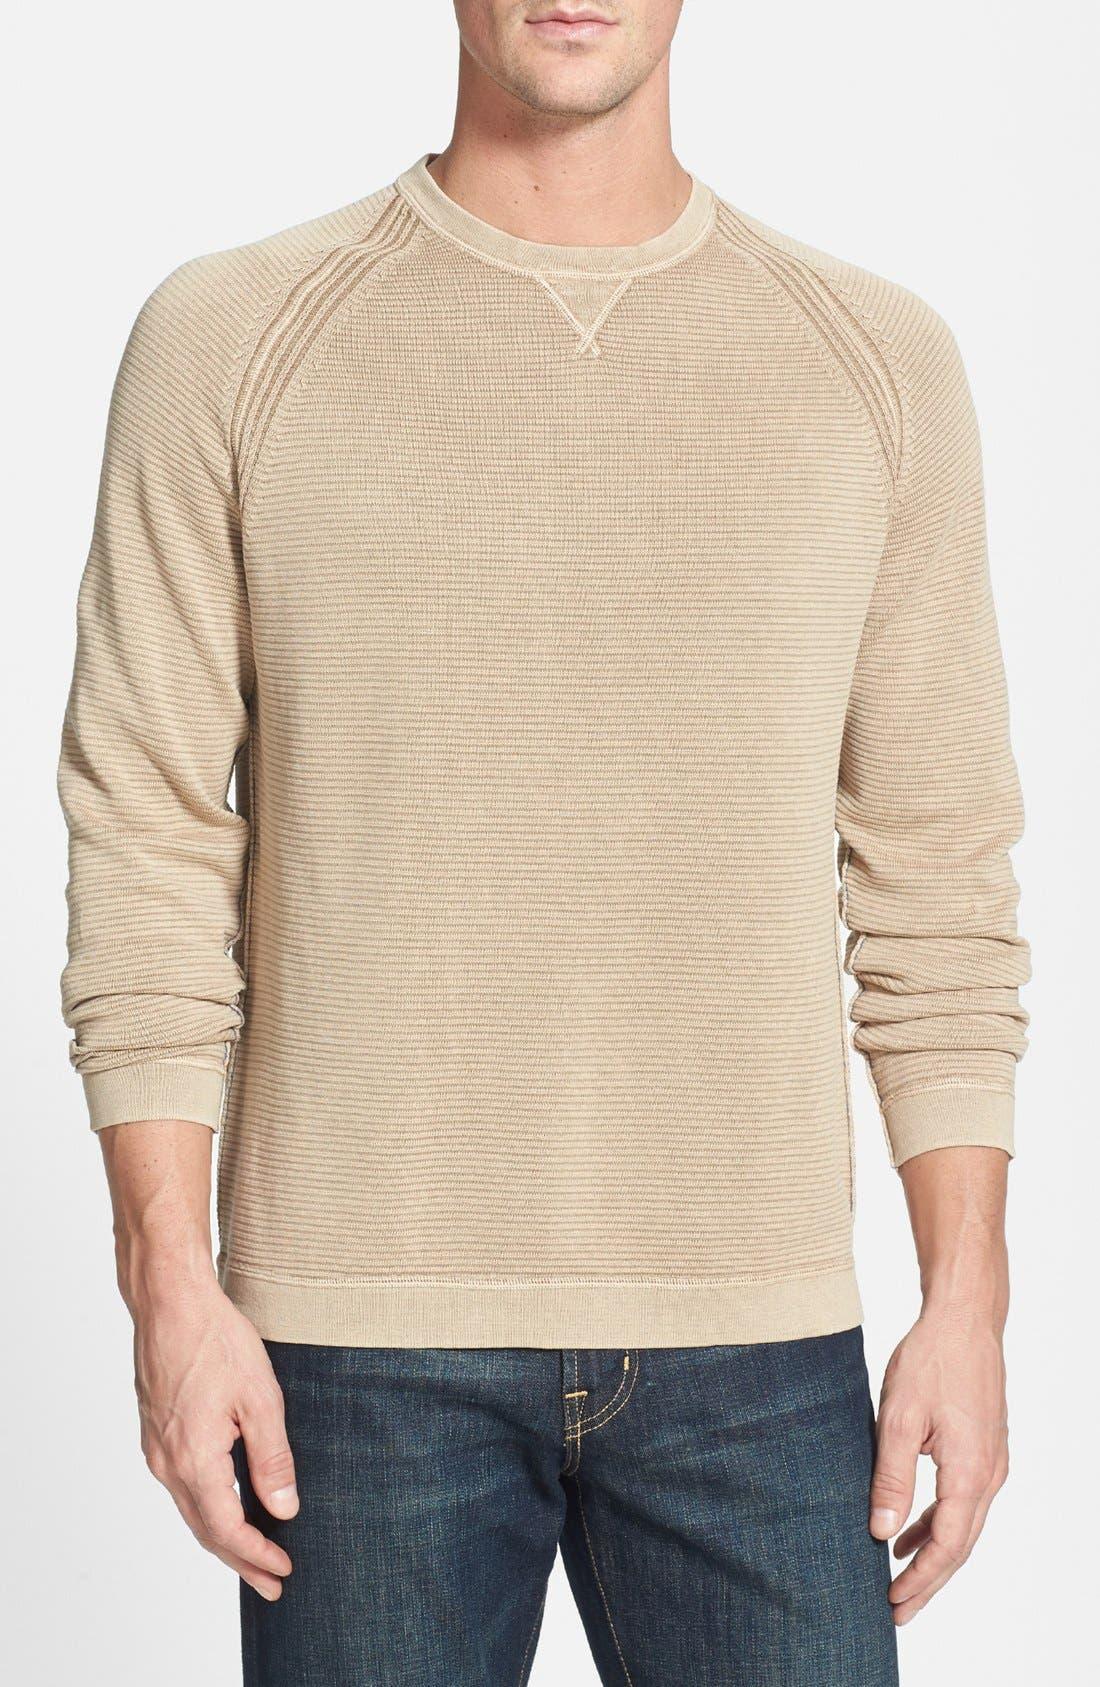 Main Image - Tommy Bahama 'Beachcomber' Sweater